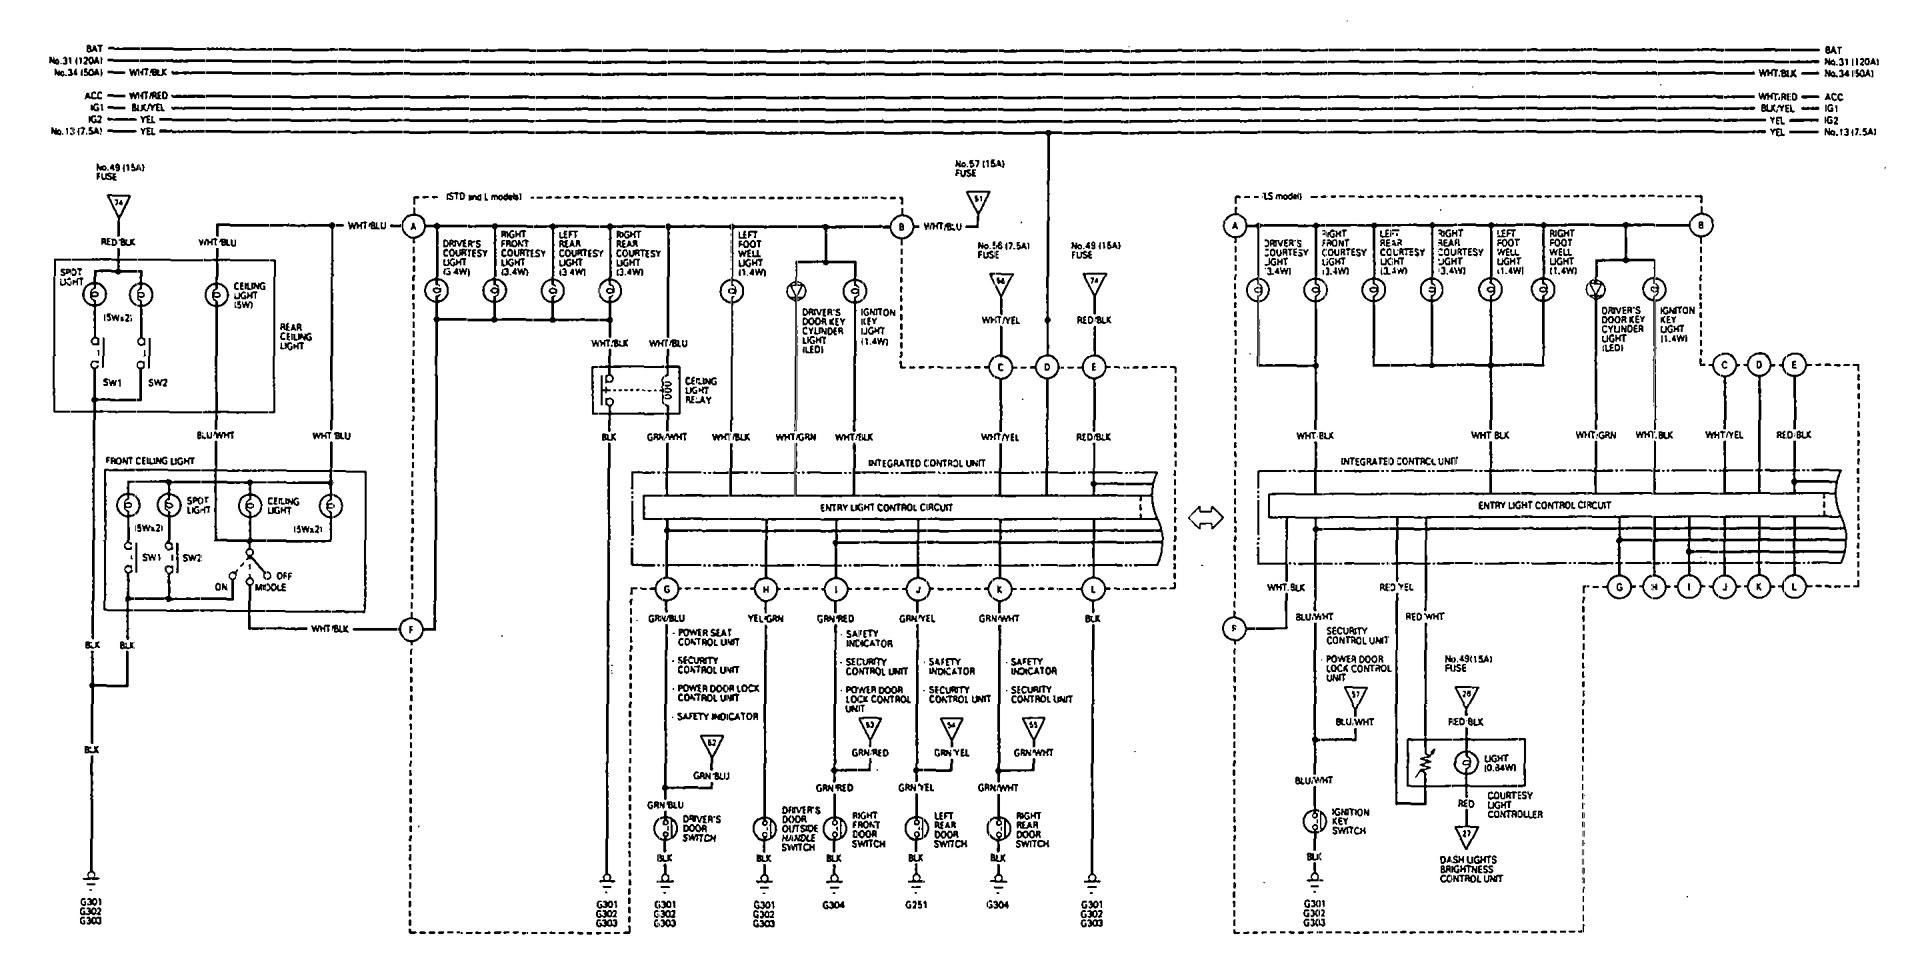 [DIAGRAM_38DE]  Acura Legend (1993) - wiring diagram - driver information center/message  center - Carknowledge.info | 1993 Acura Legend Wiring Diagram |  | Carknowledge.info